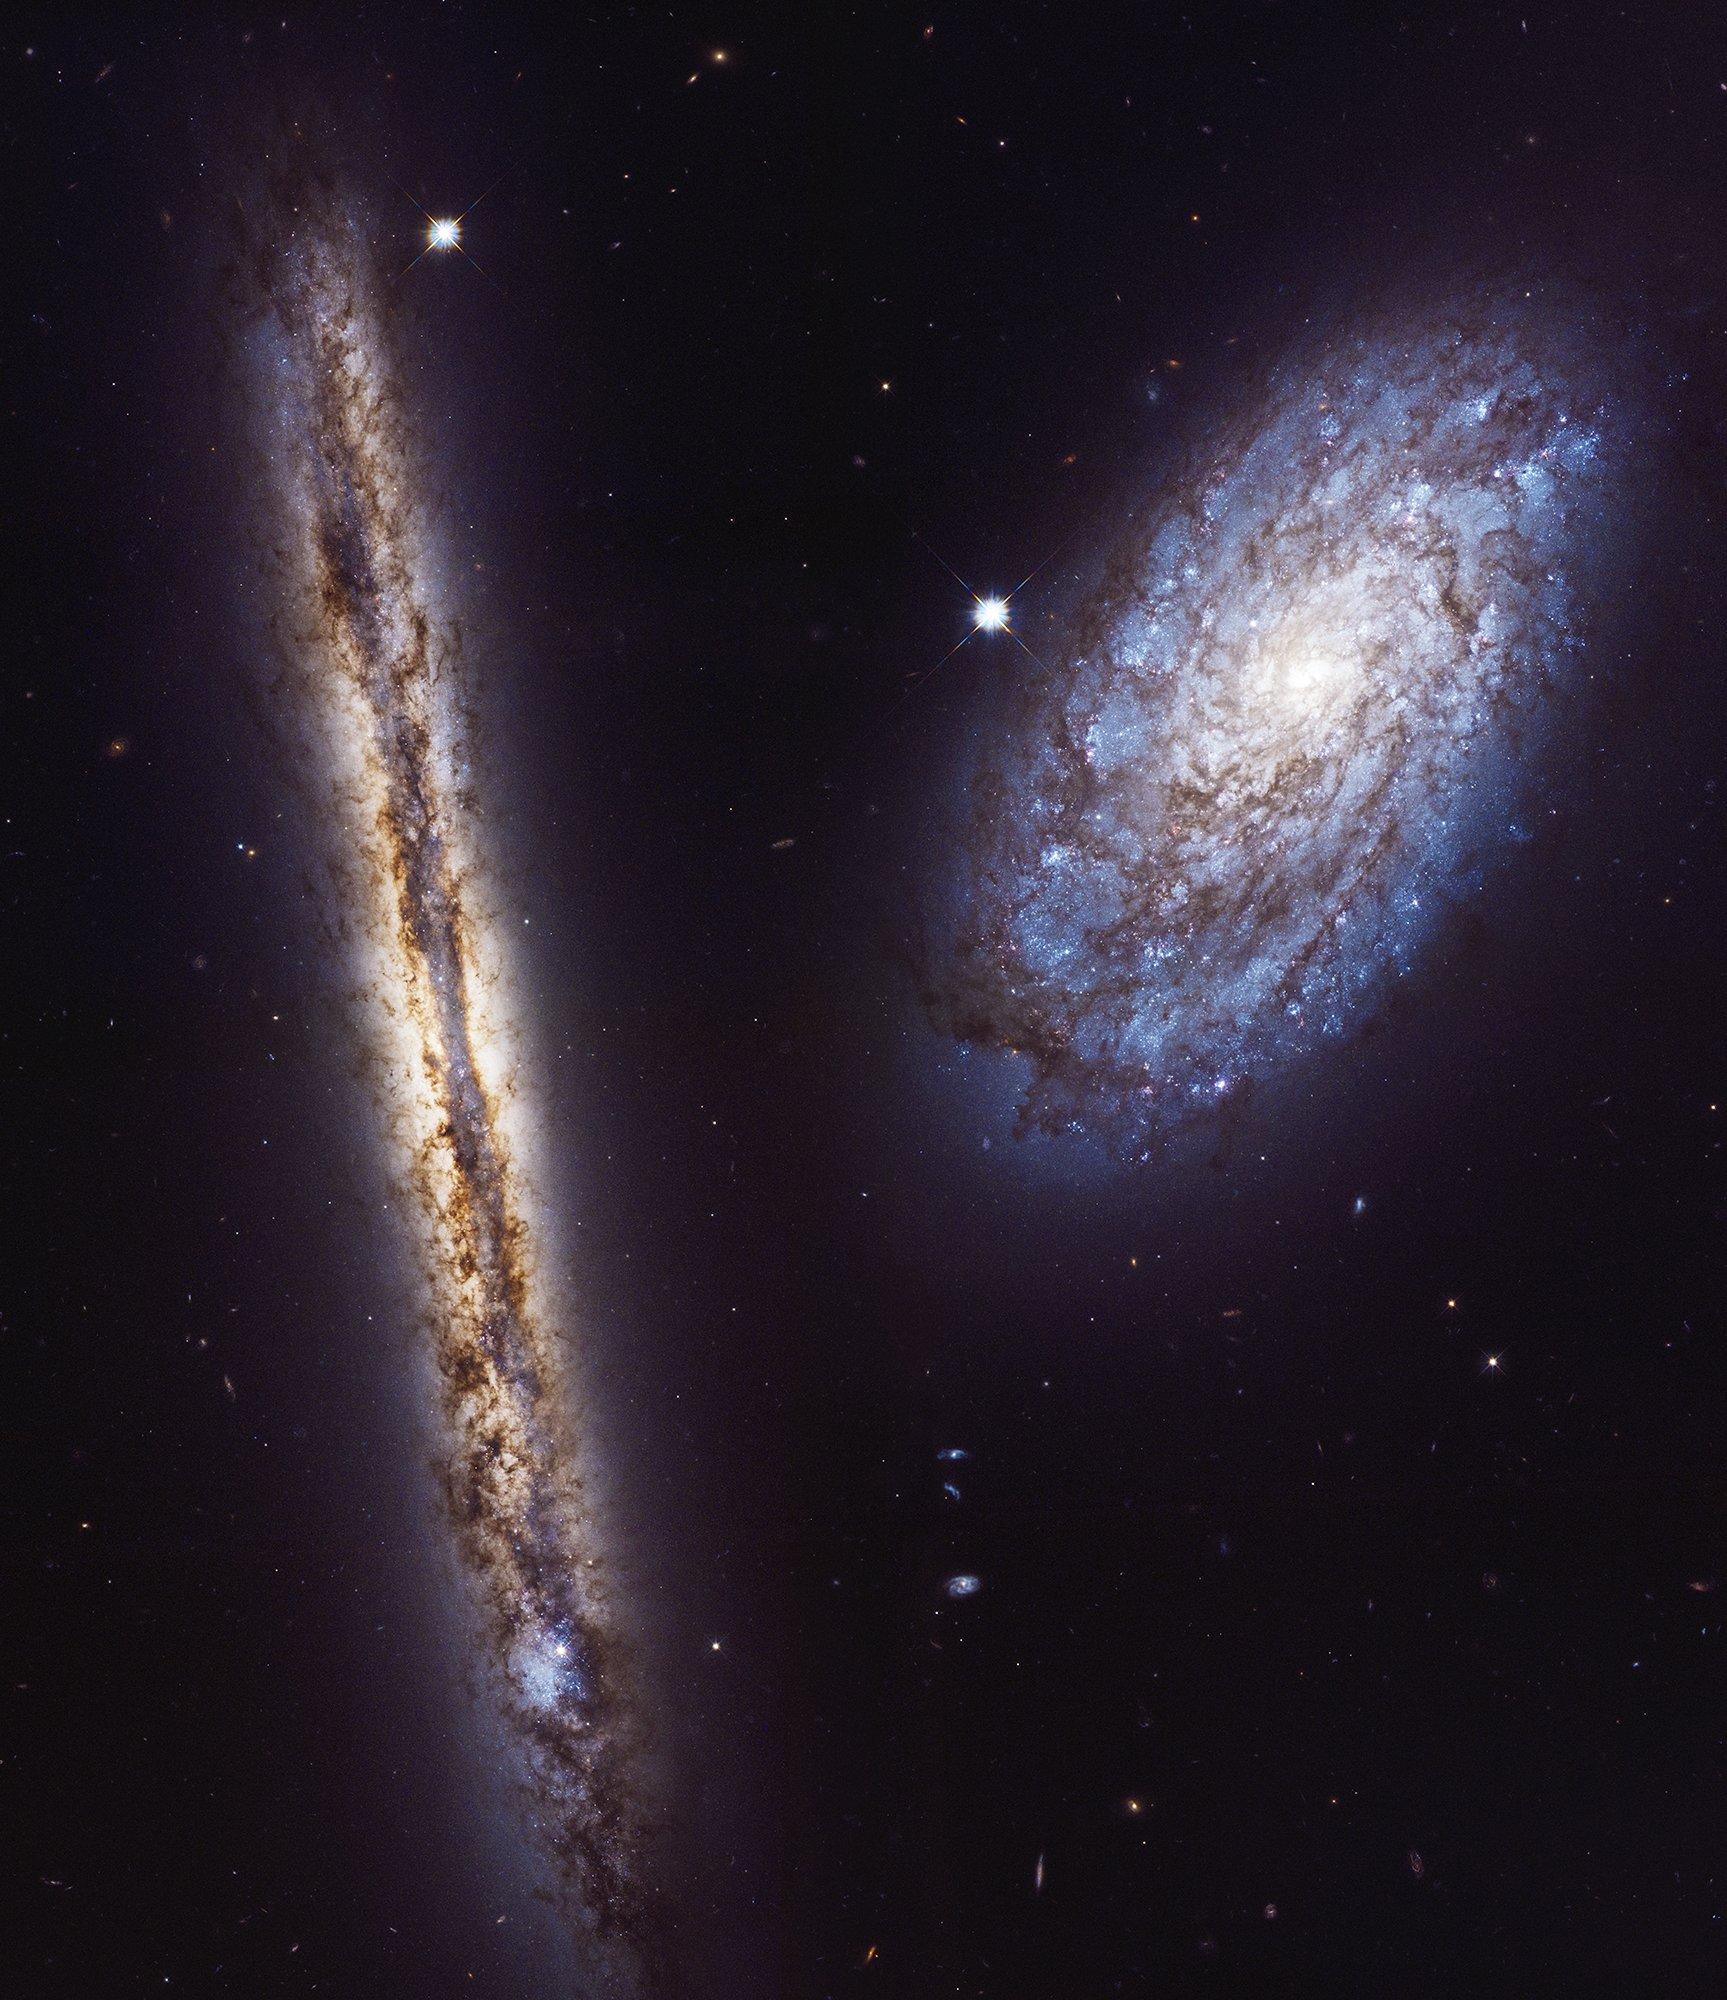 STSCI_NGC4302_4298.jpg